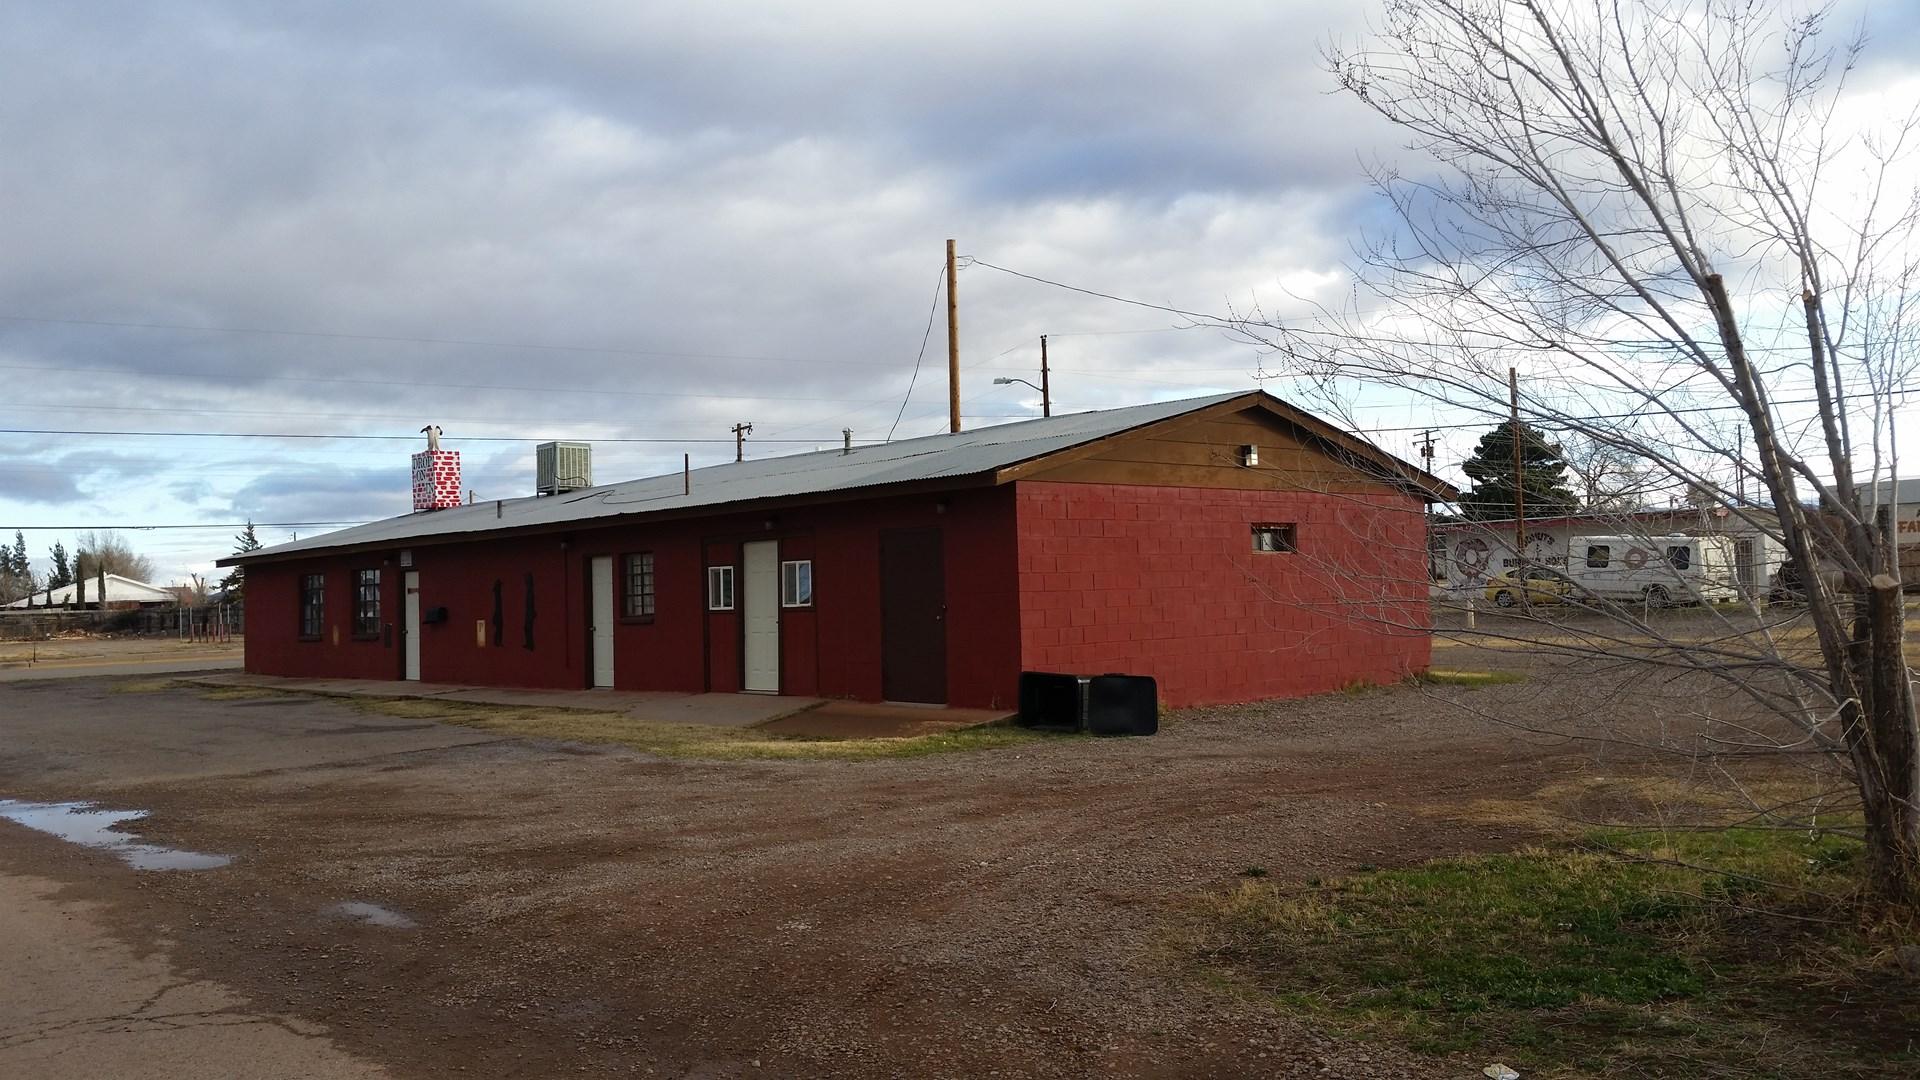 Commerical building in Tularosa,nm